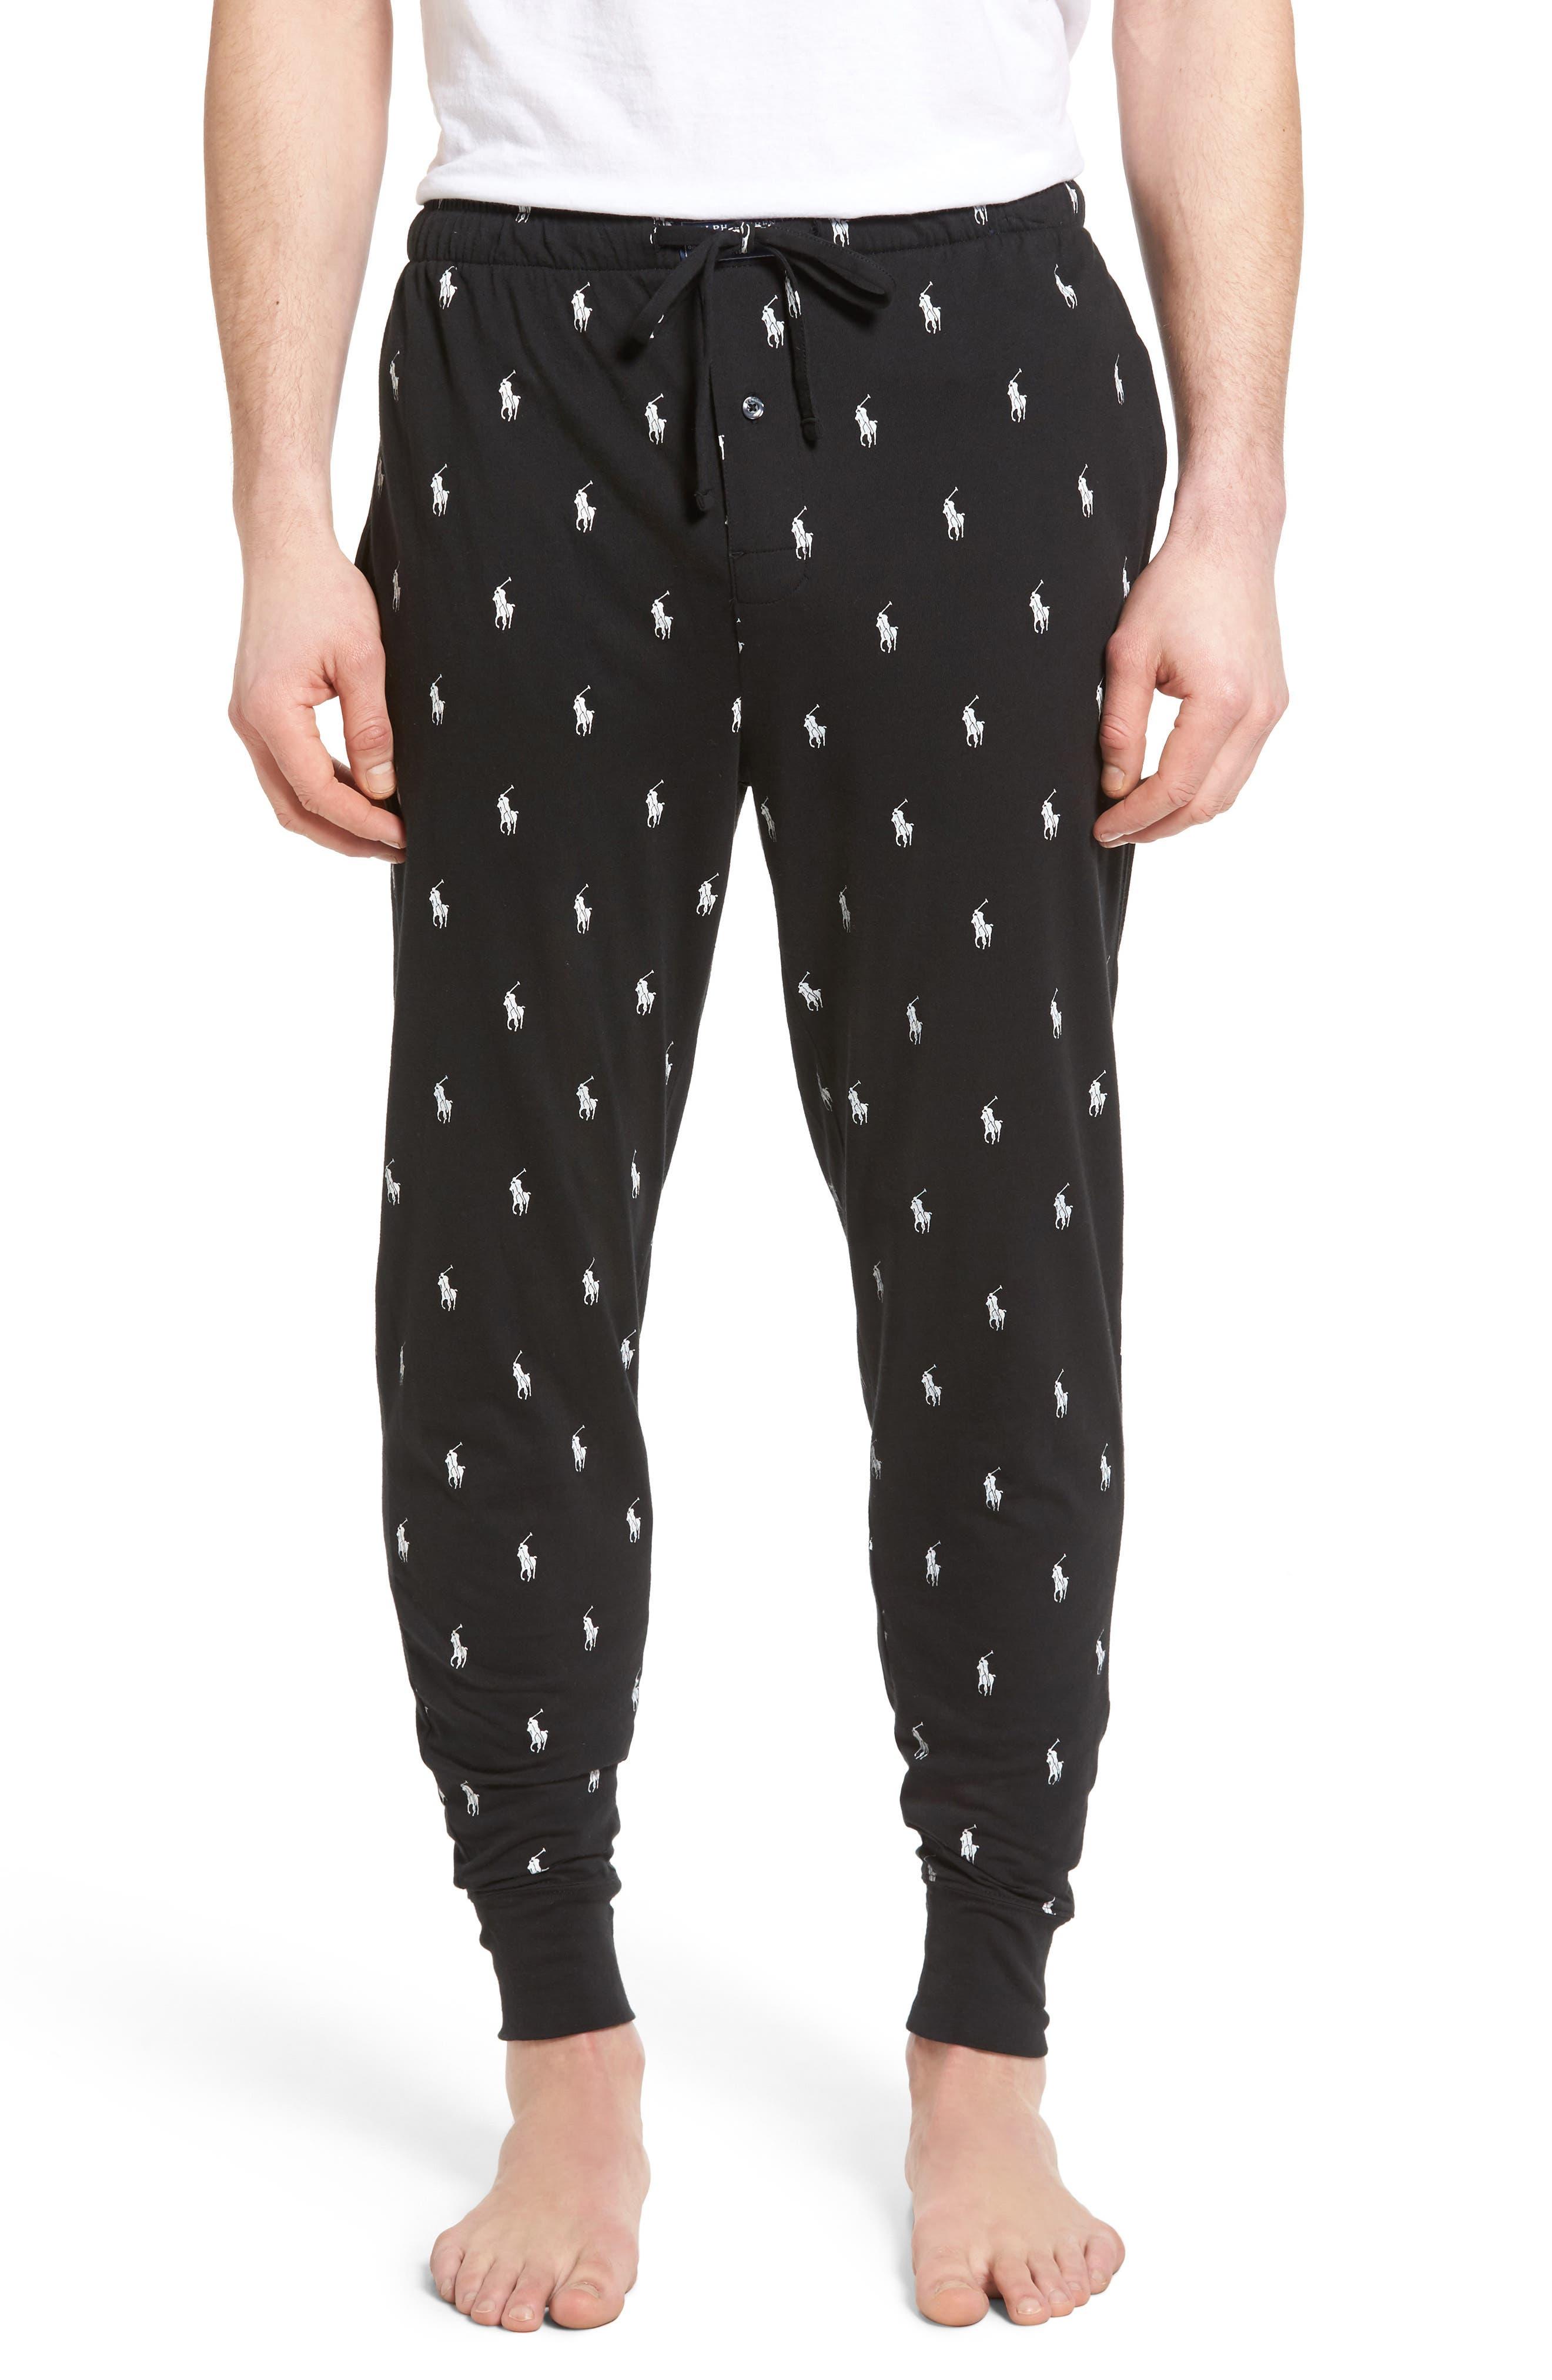 Knit Pony Lounge Pants,                         Main,                         color, Black